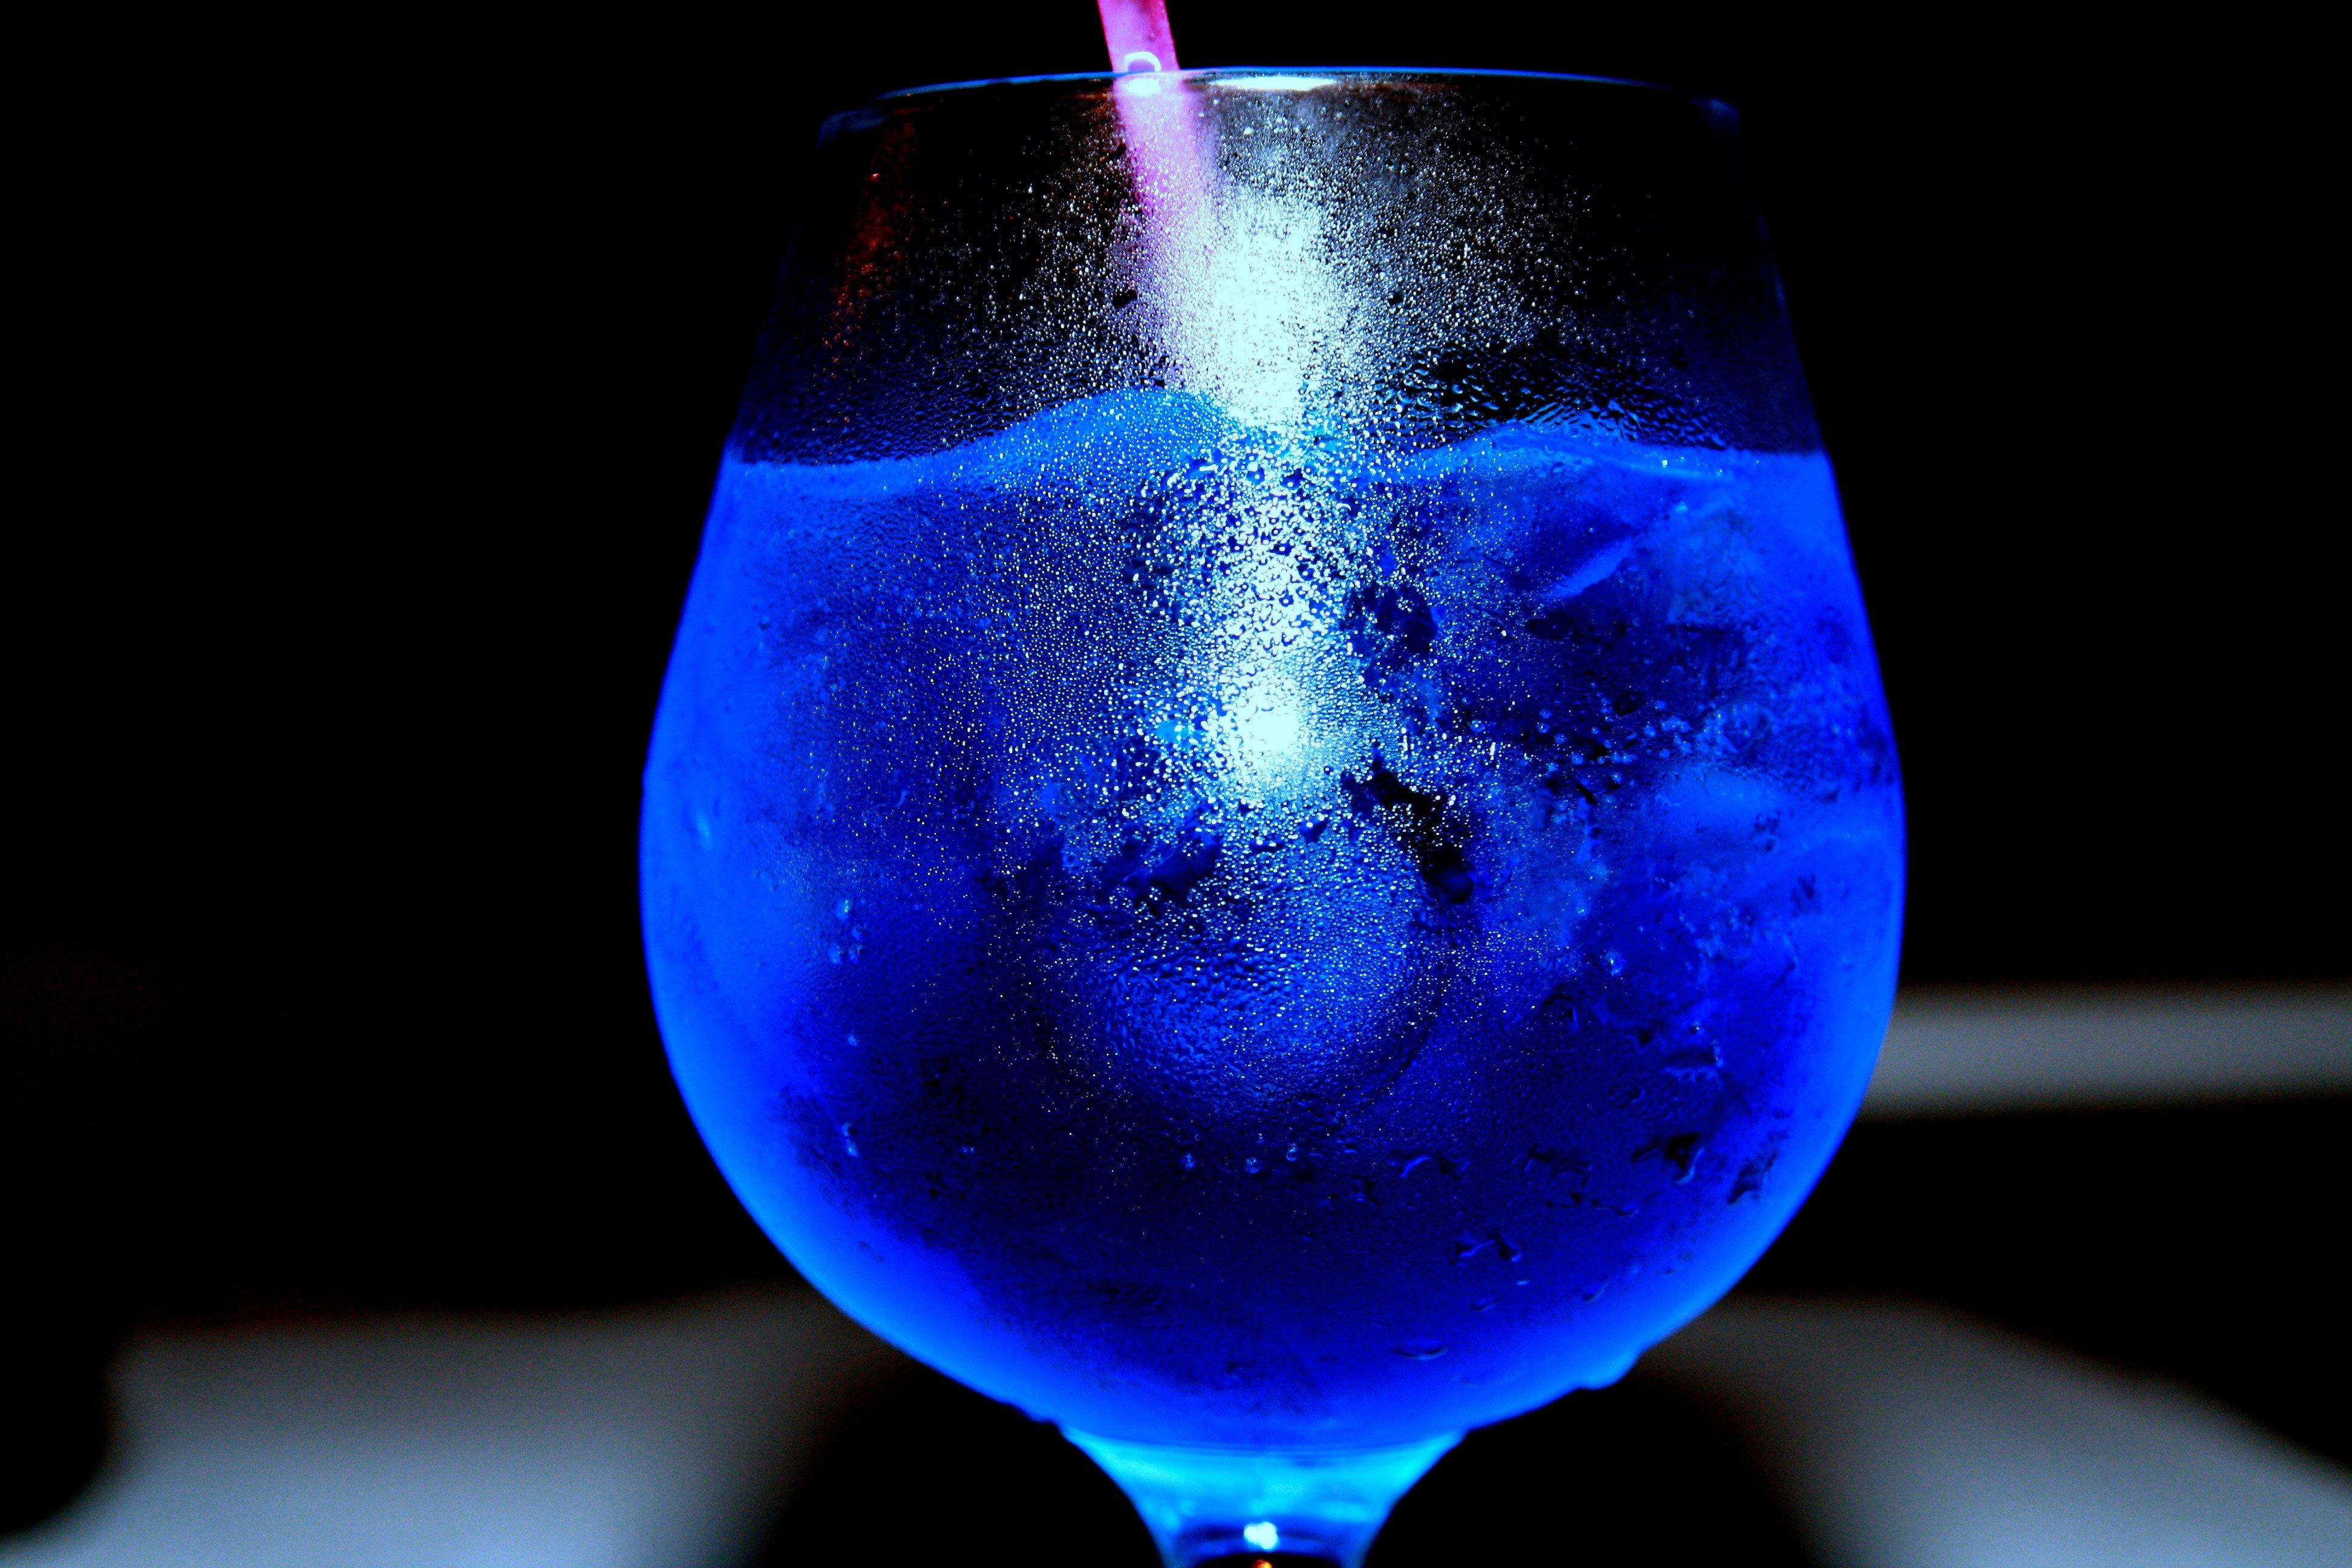 Liquid Hd Wallpaper: Drinking Glass, Liquid HD Wallpapers / Desktop And Mobile